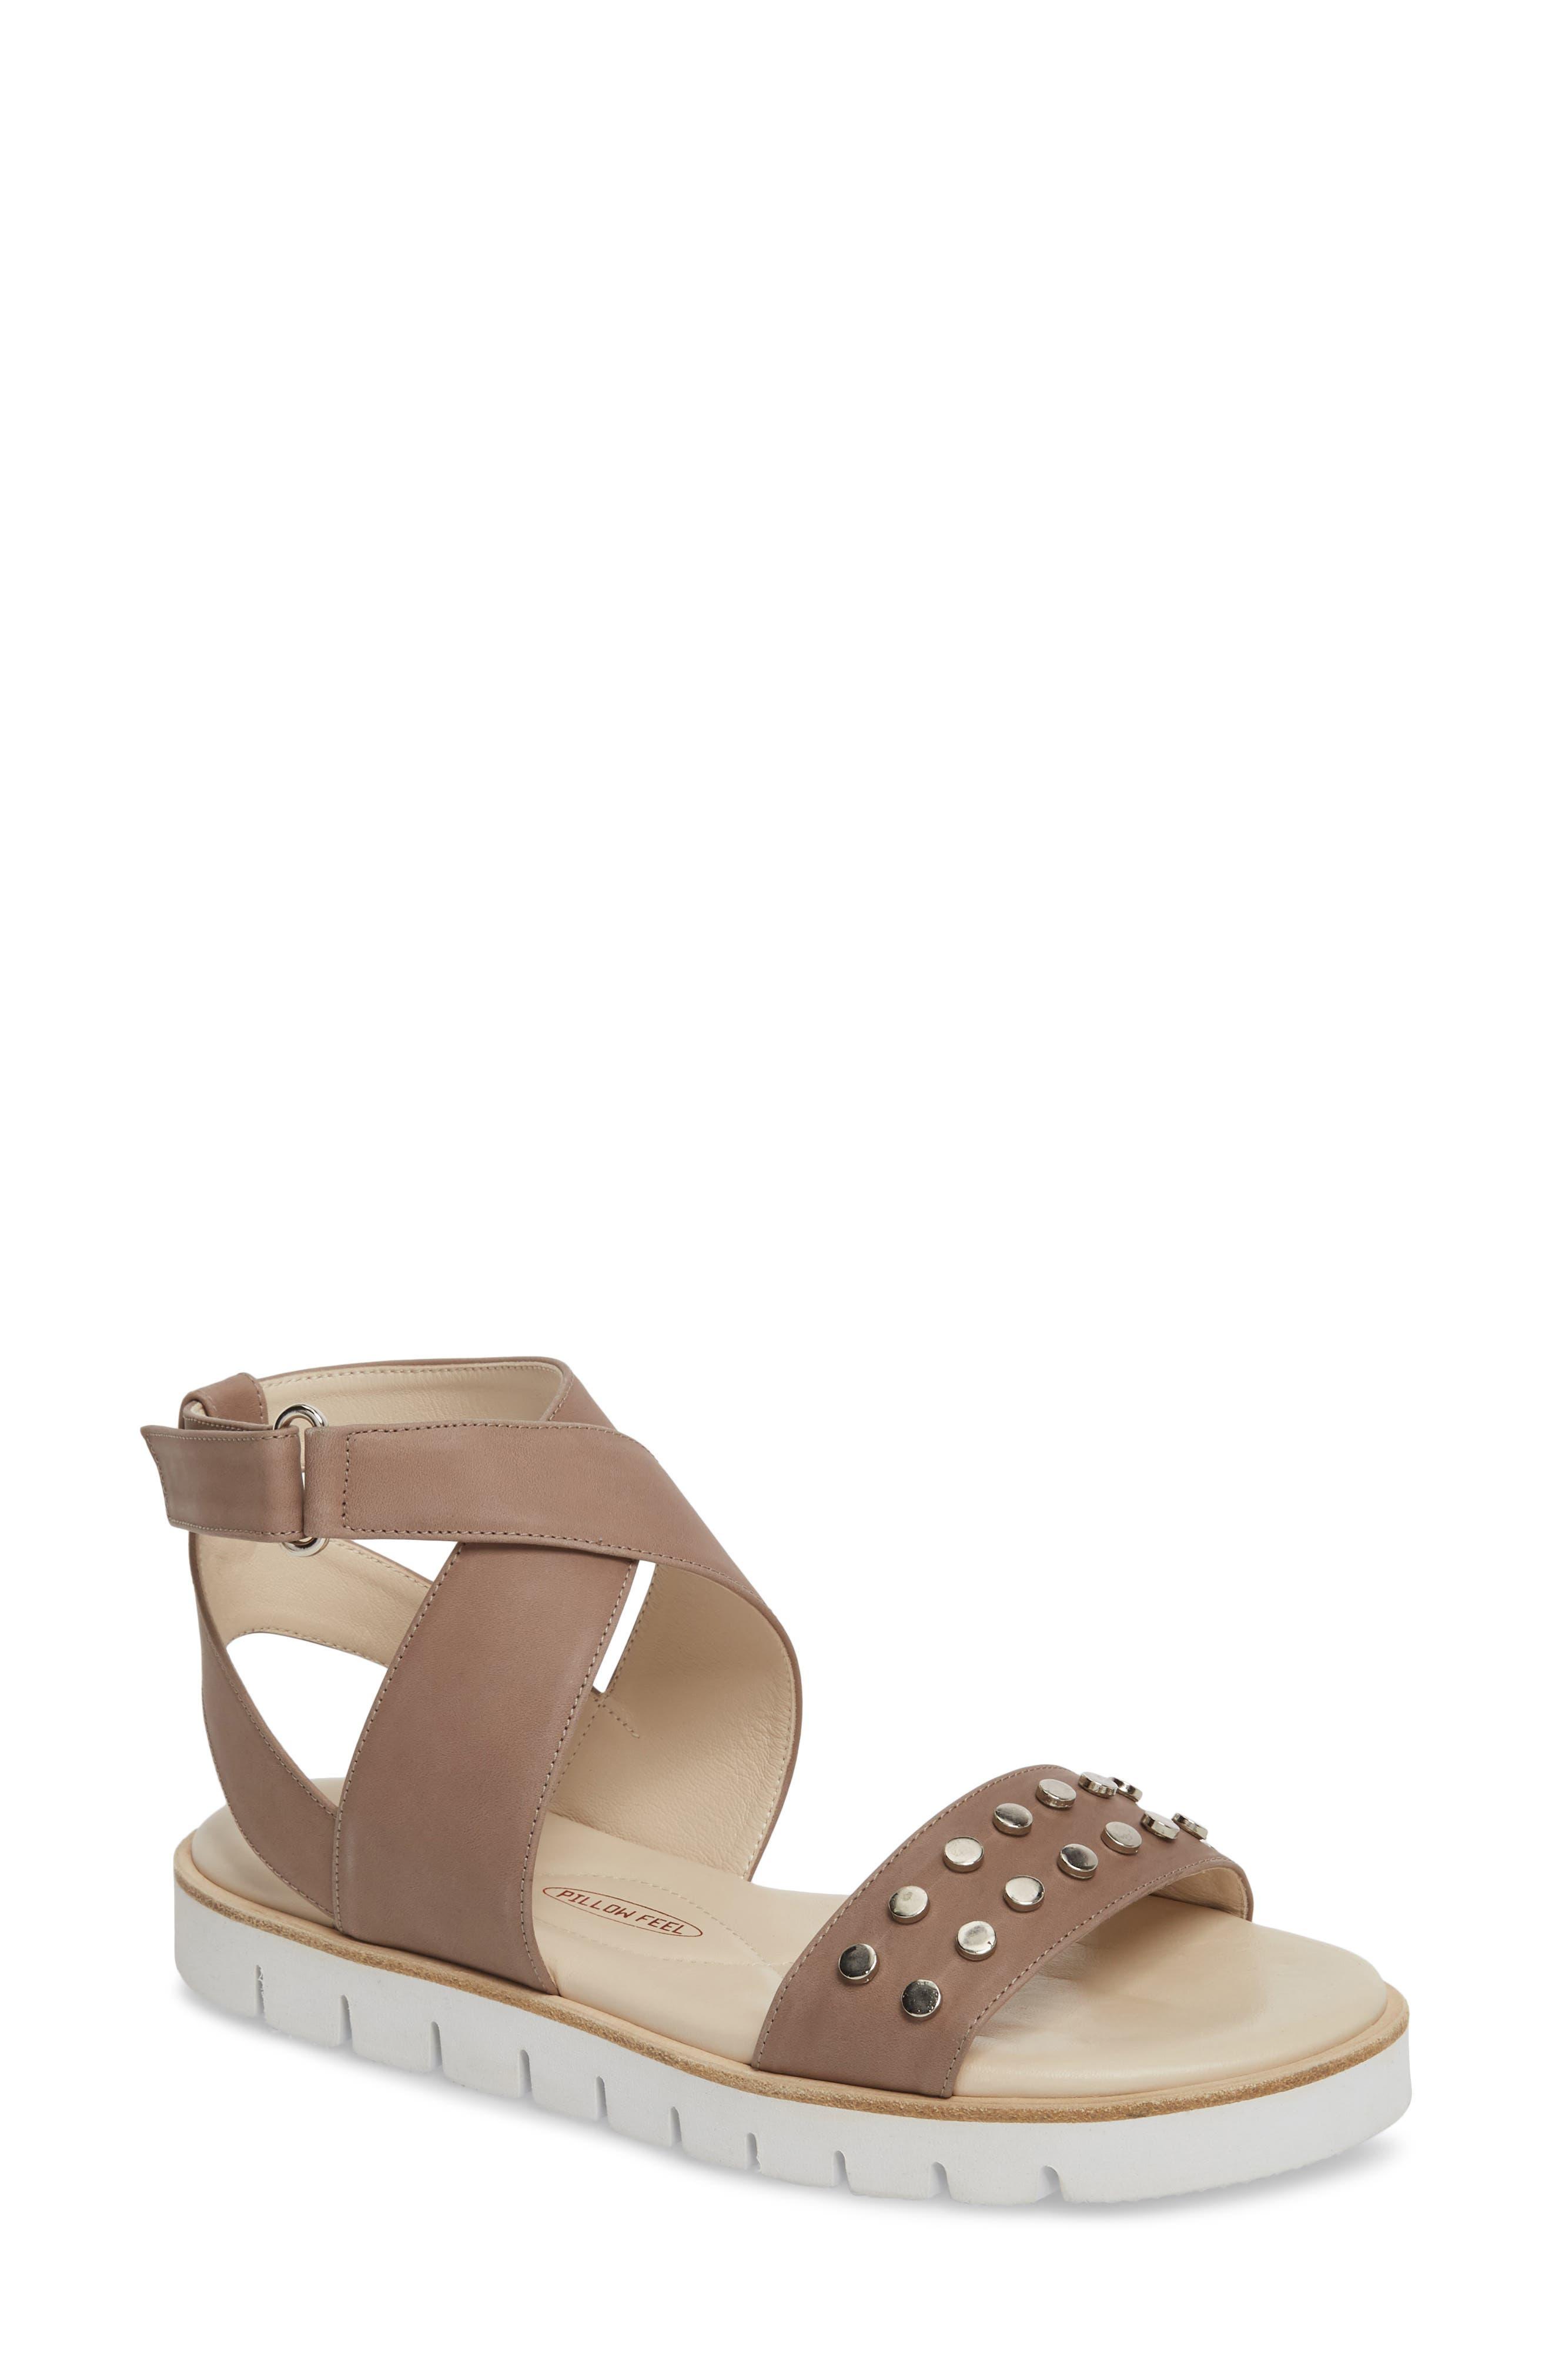 Barlume Sandal,                         Main,                         color, Taupe Leather